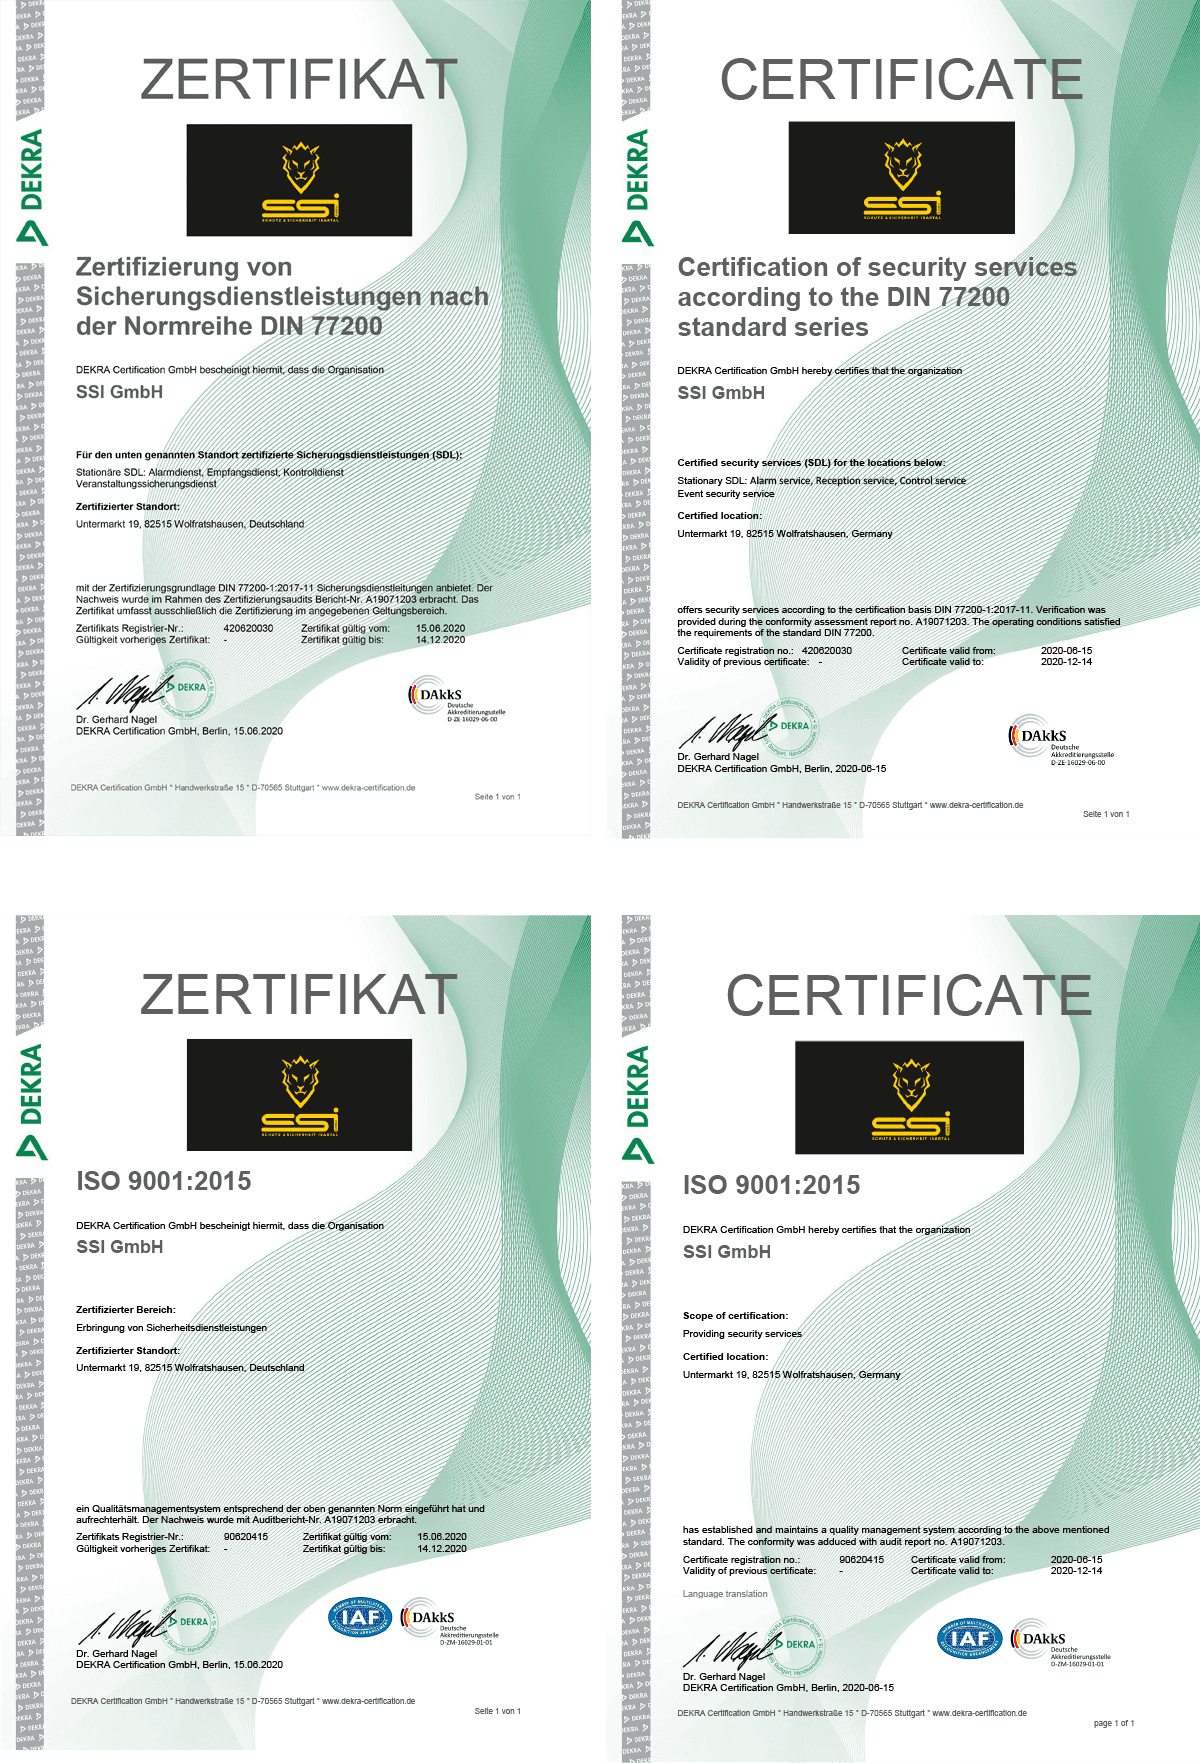 SSI GmbH Dekra Urkunden